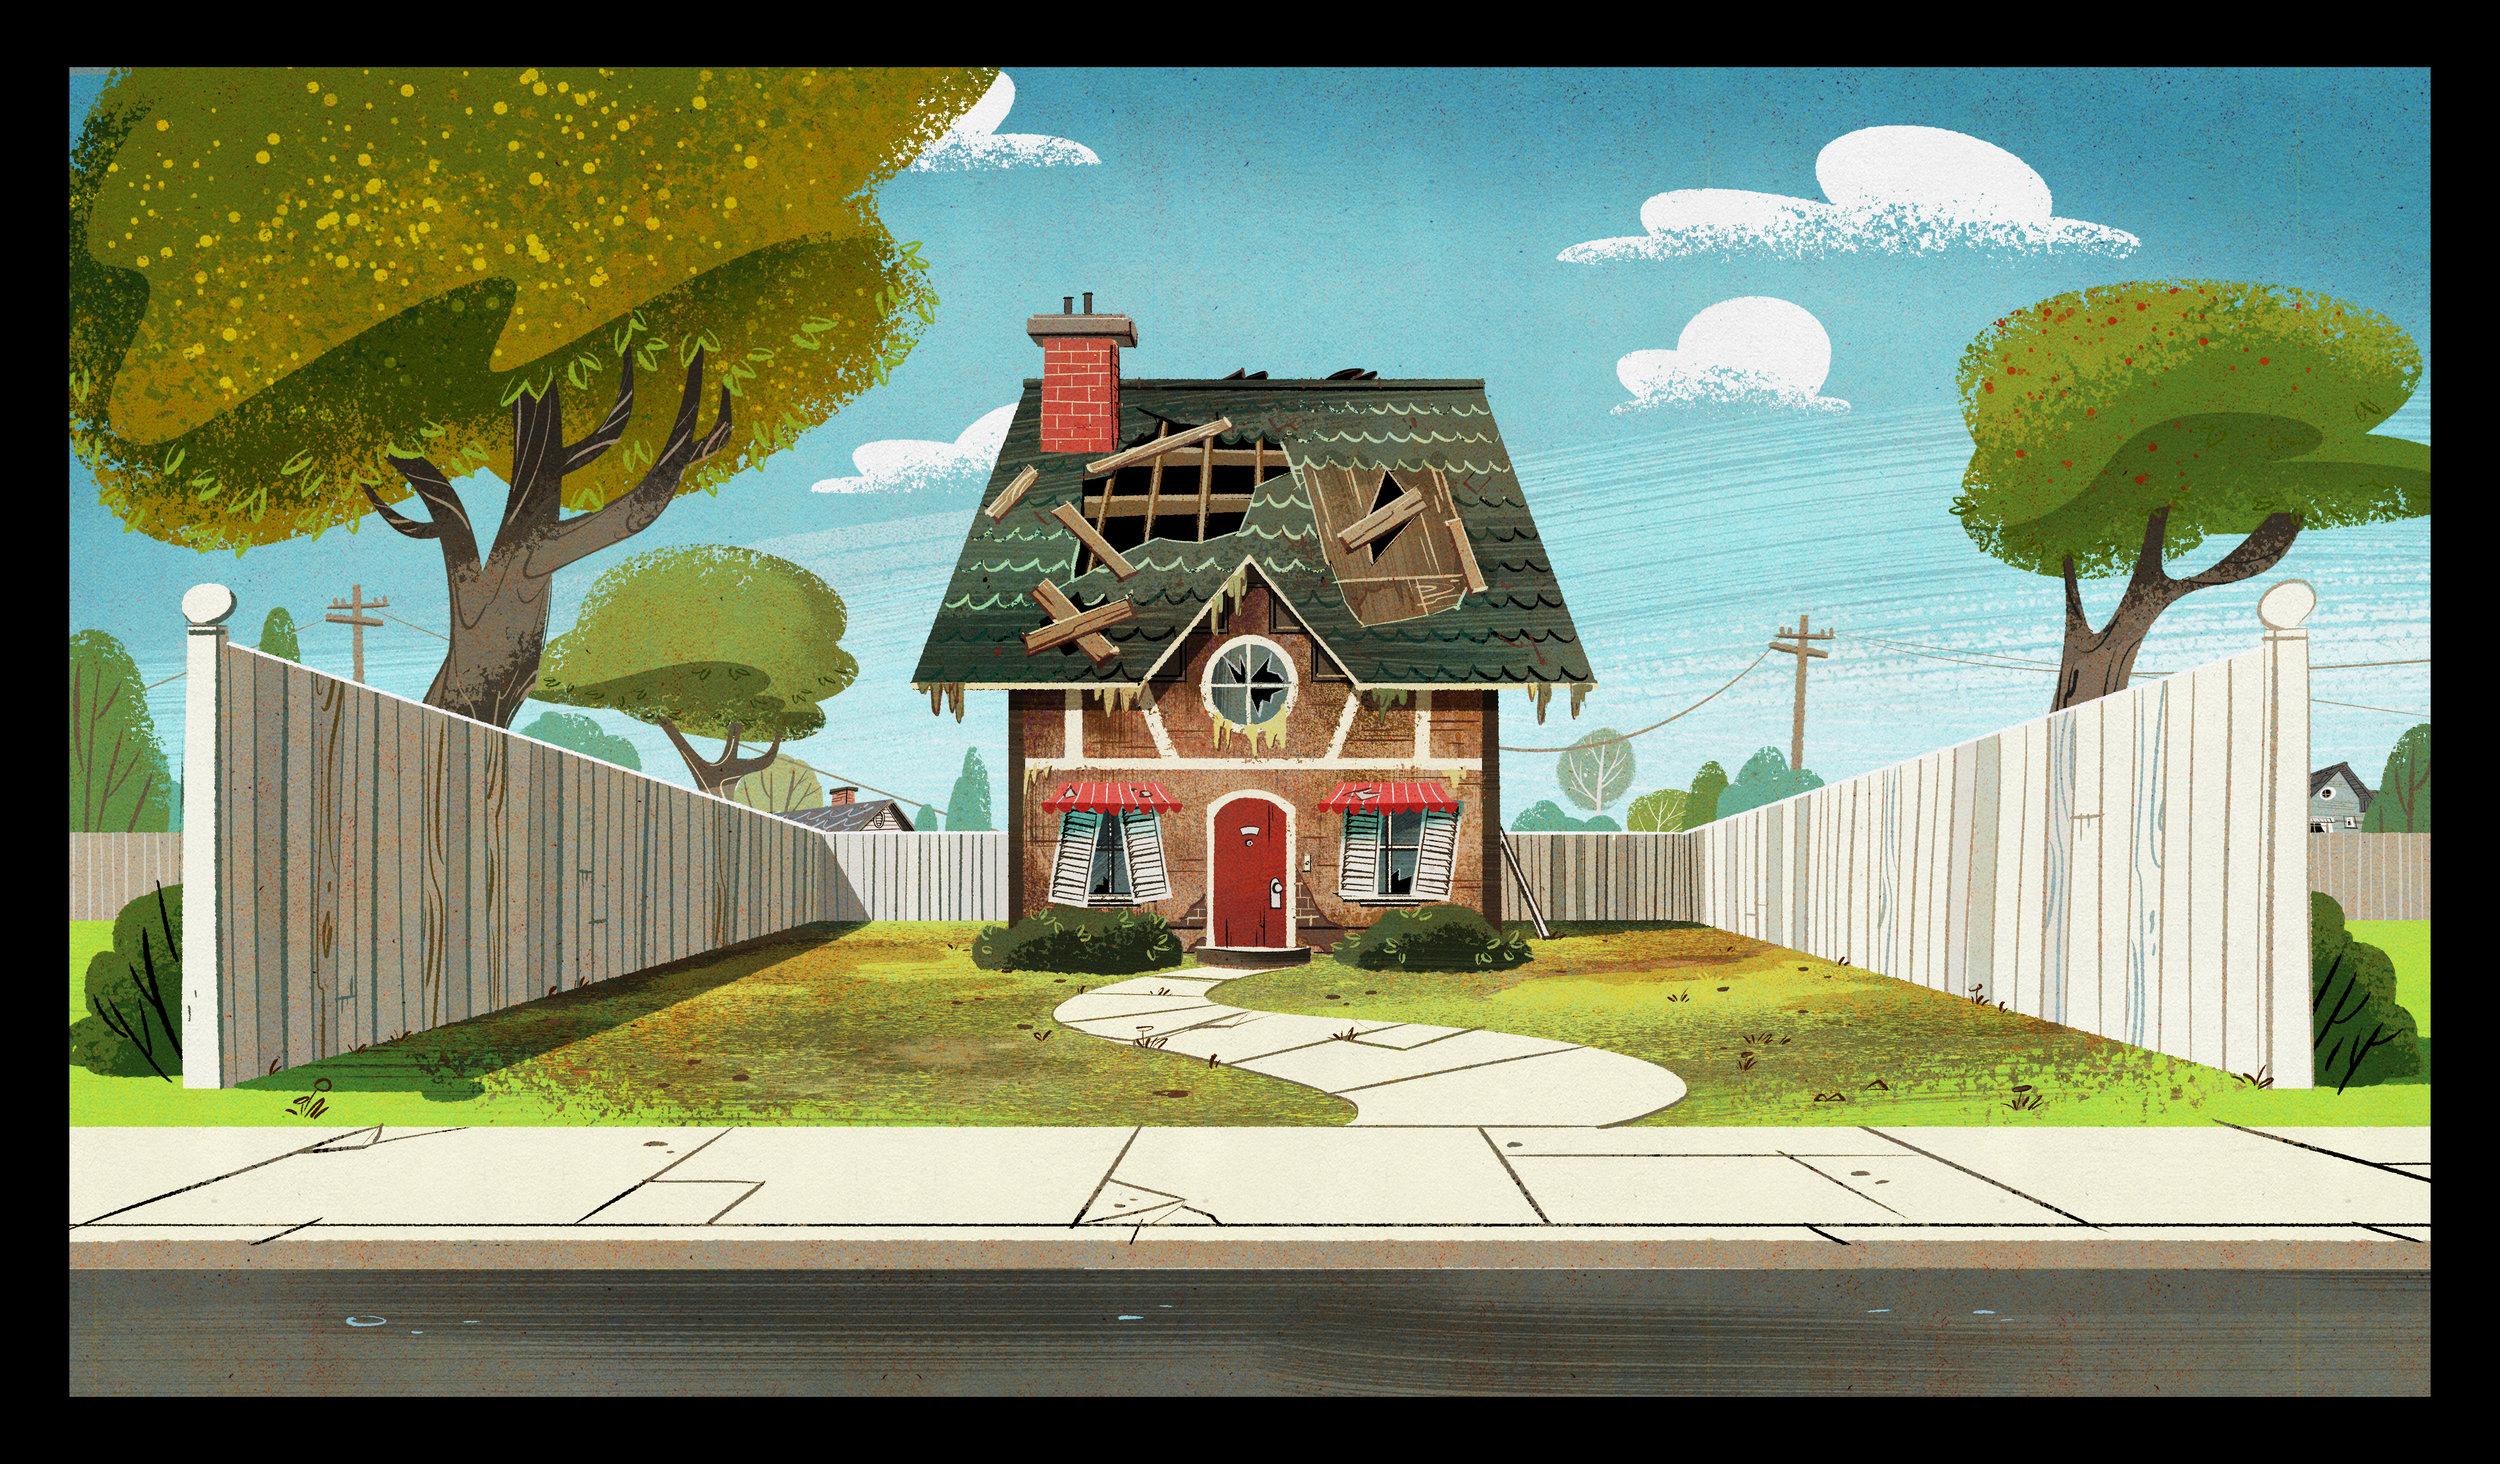 482M_504Sc1_3_38_View_Of_House_From_Street_RETAKE.jpg